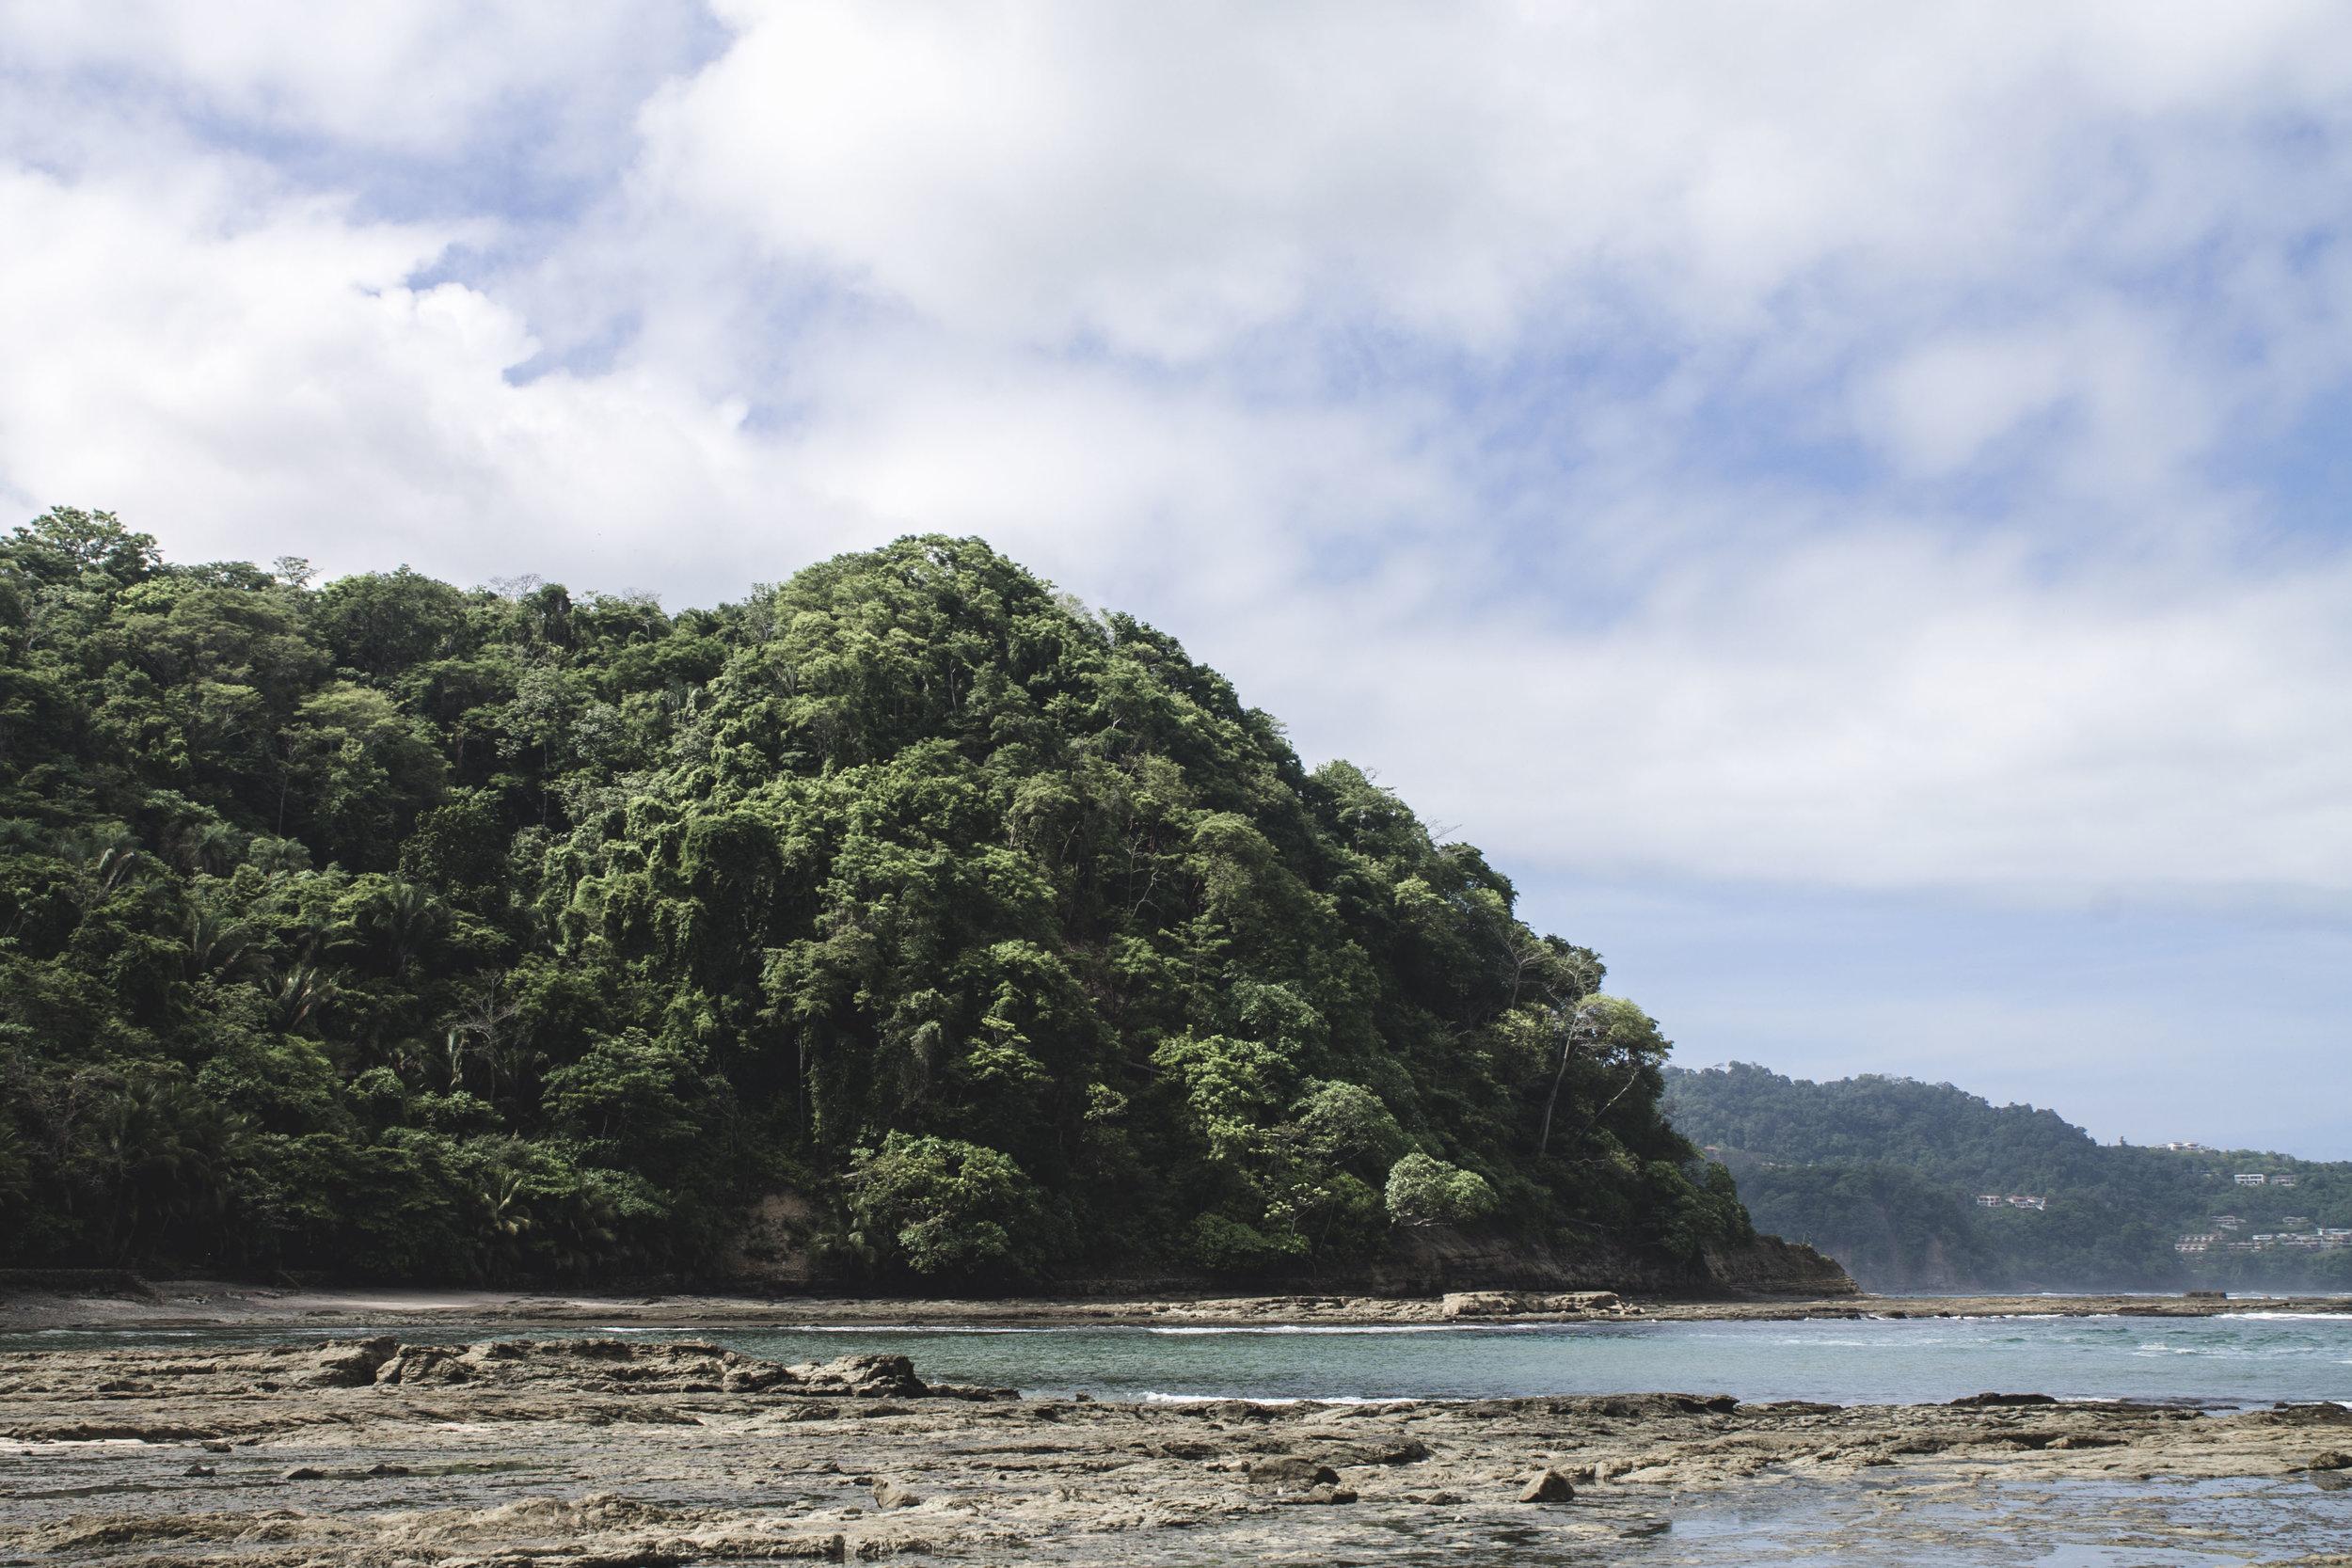 View from the private beach at Villa Caletas in Jaco, Costa Rica